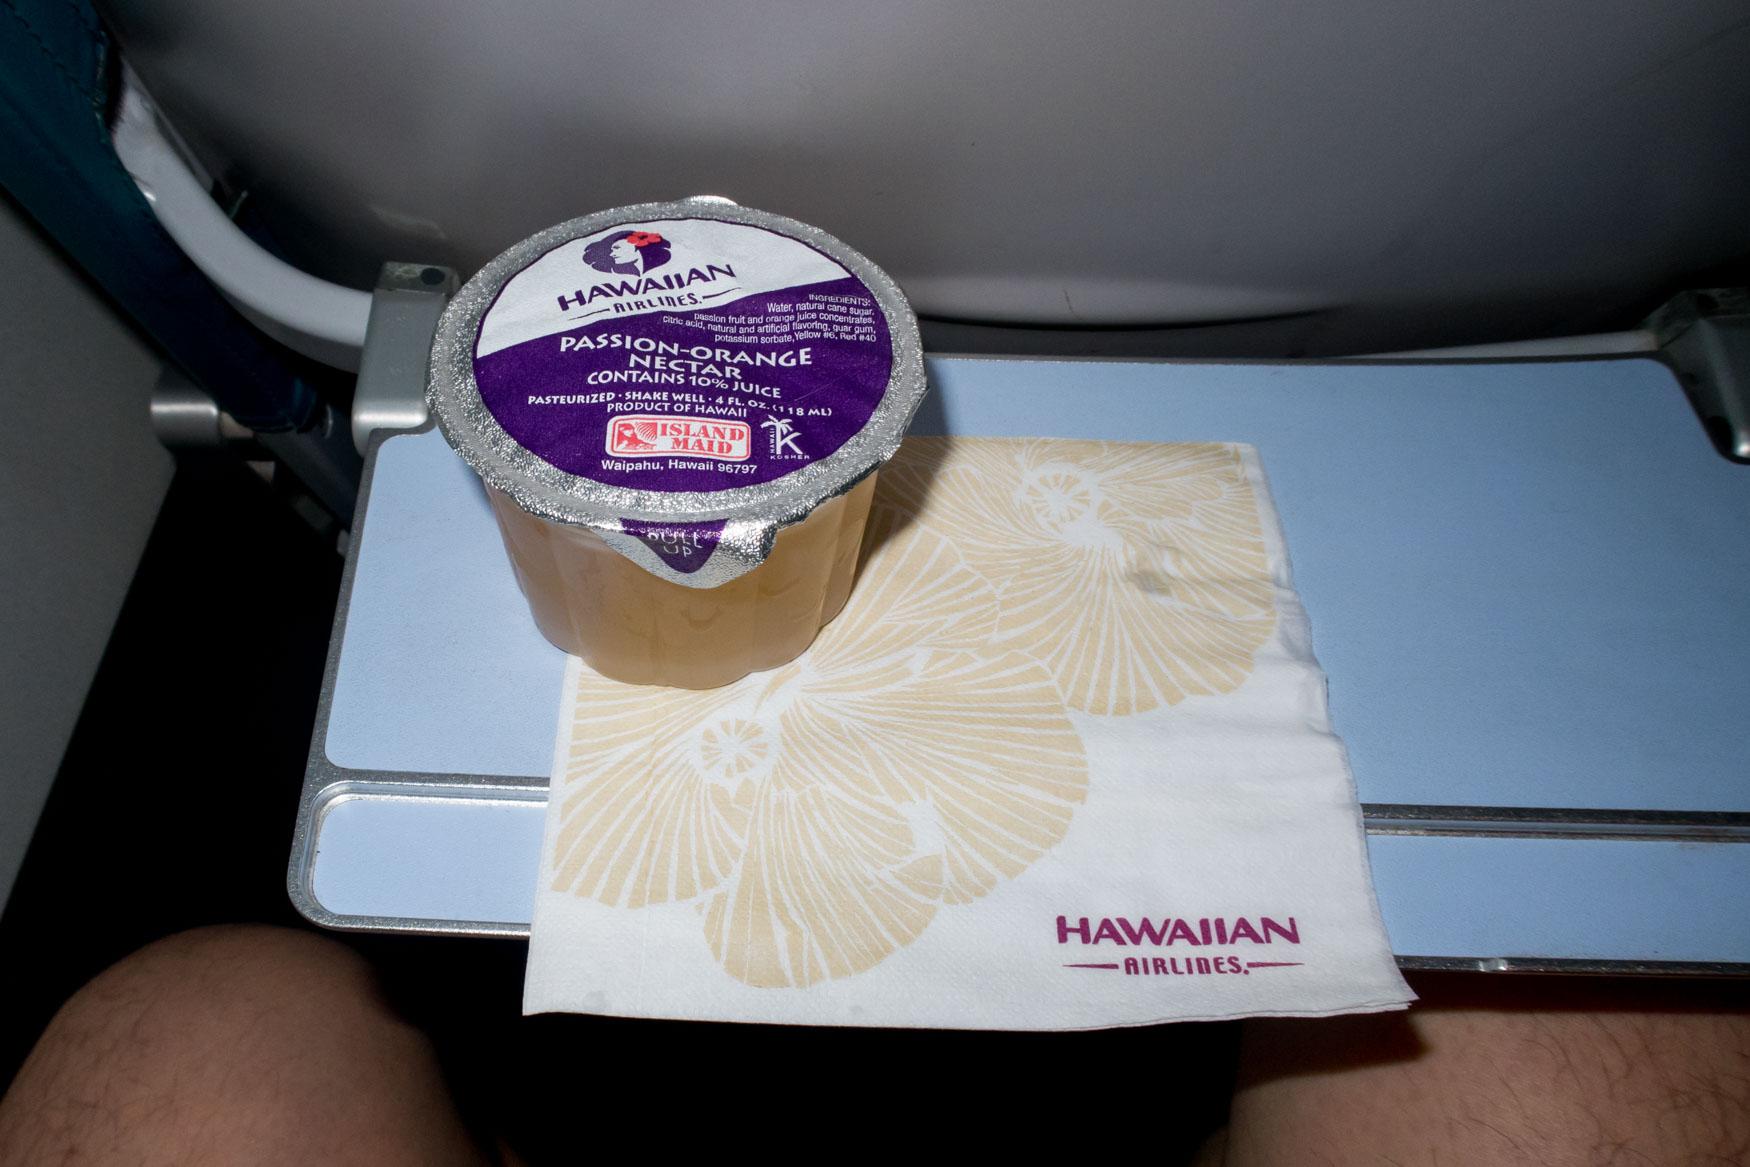 Hawaiian Airlines Inter-Island Service